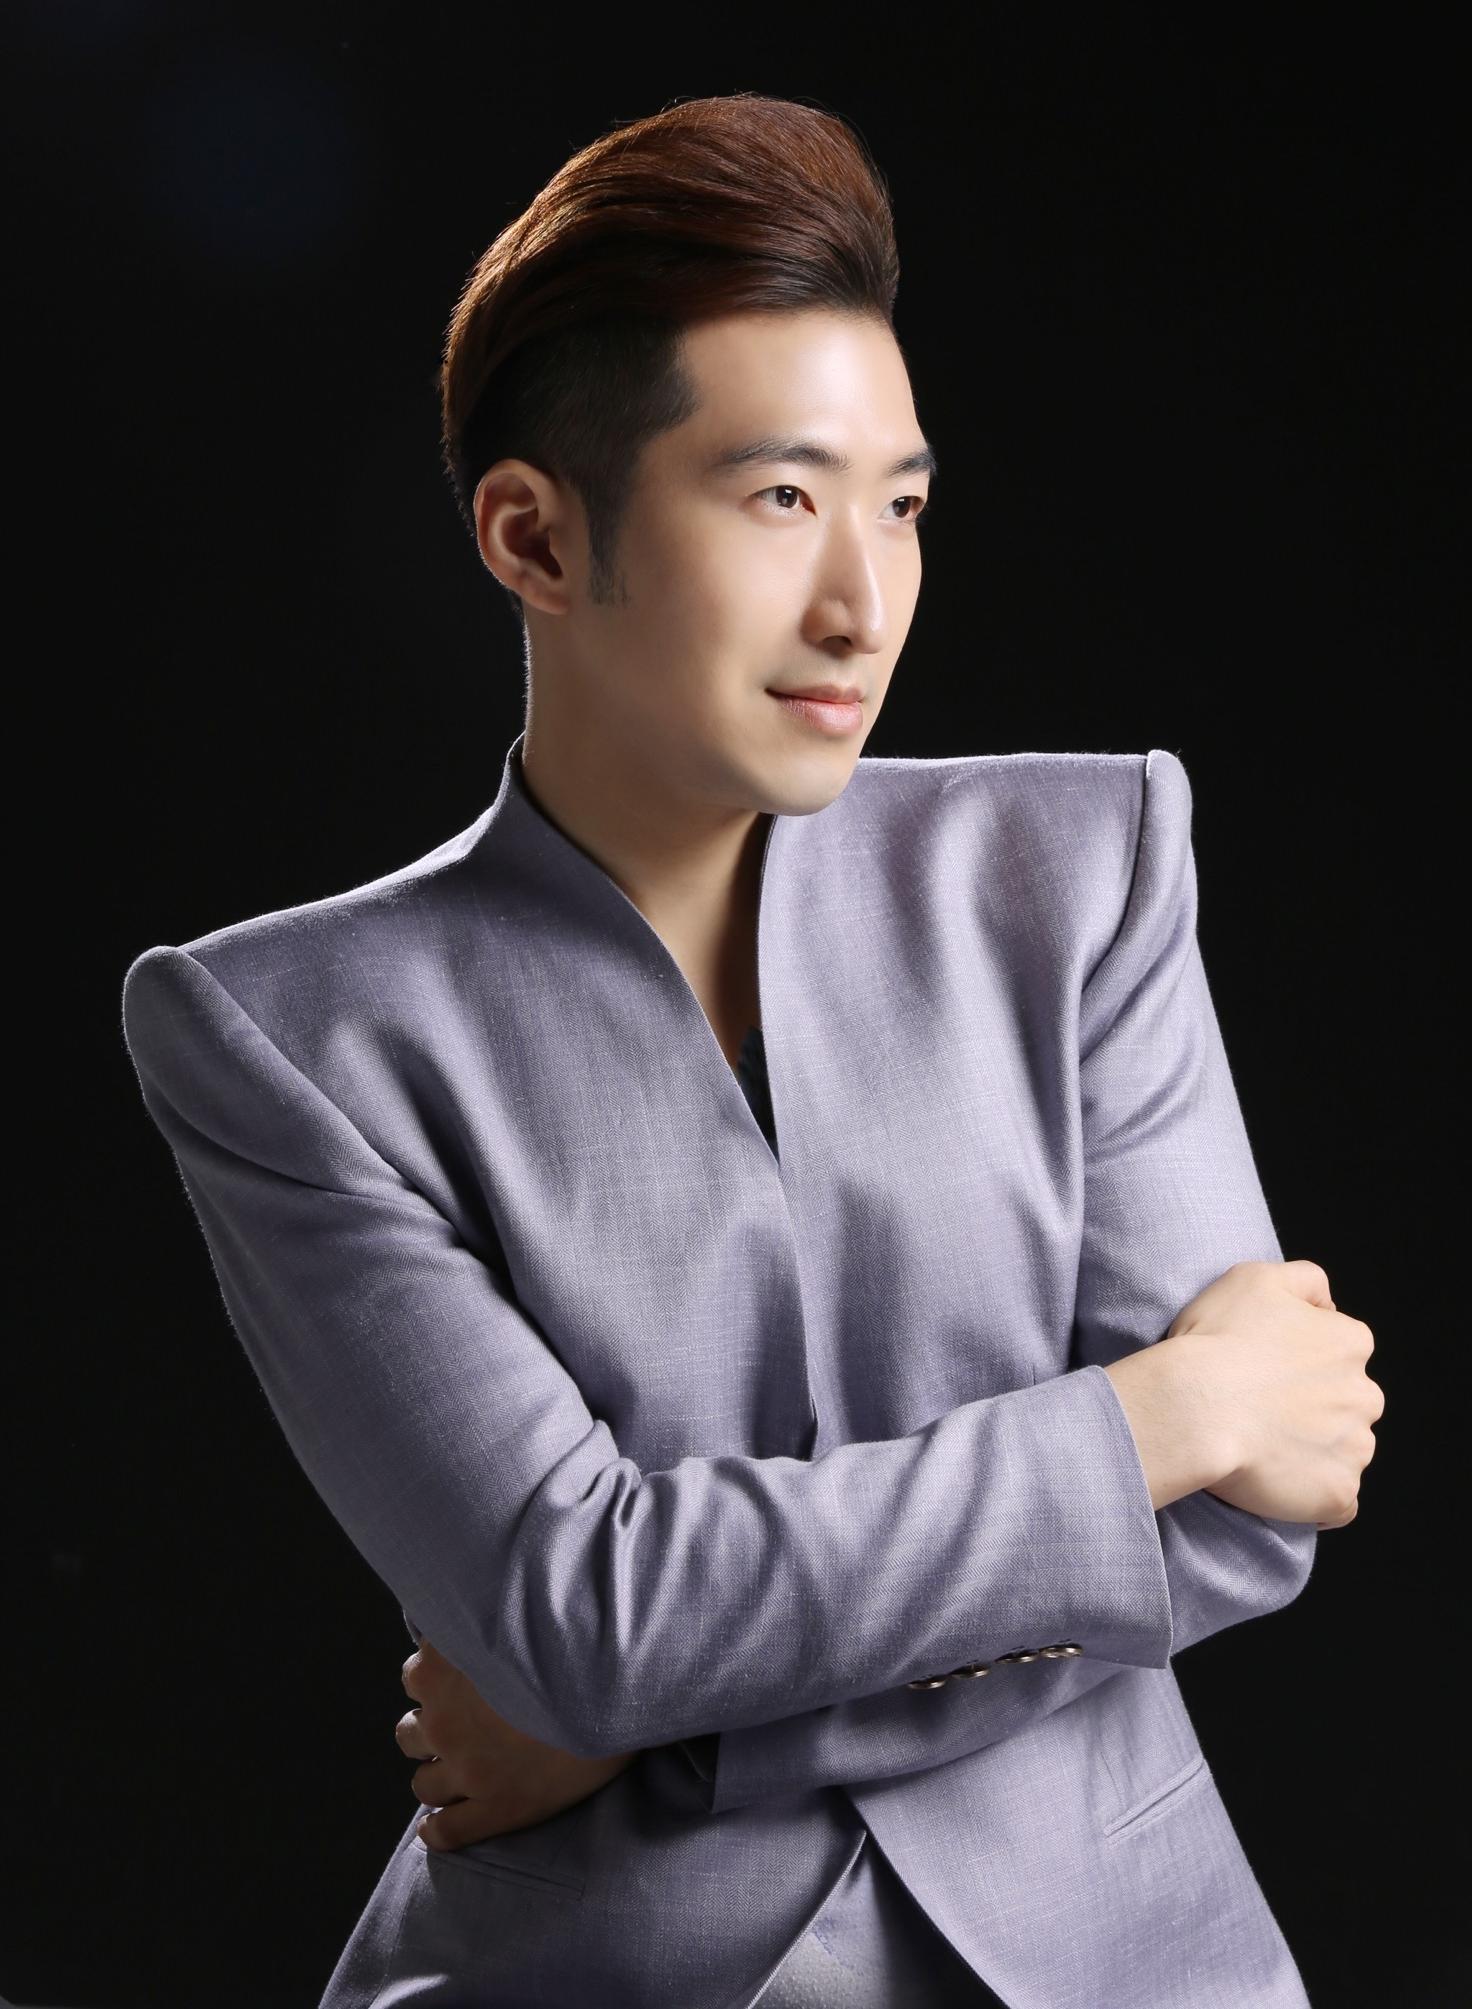 Wonjoon Cha